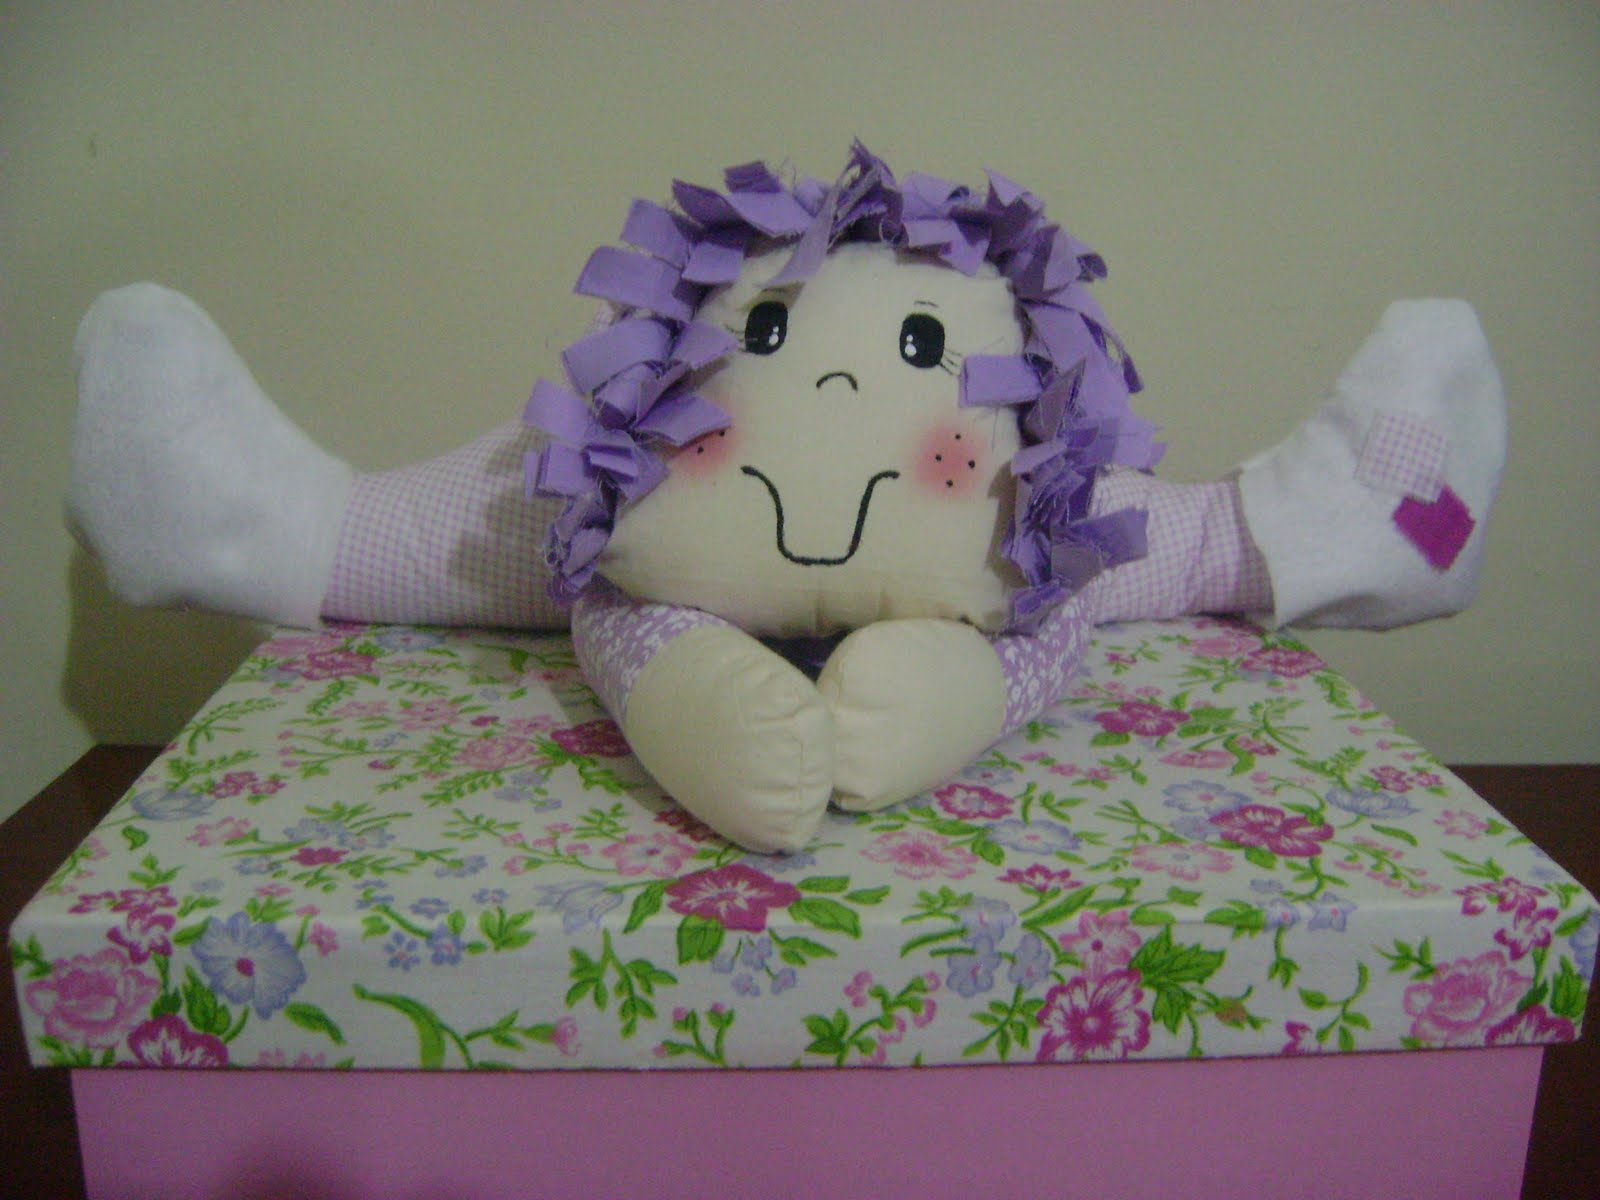 http://4.bp.blogspot.com/_R6oLhz4fl2c/S_BN-5AeMnI/AAAAAAAAABI/EOZZCuTkmmk/s1600/boneca+peso+de+porta.jpg